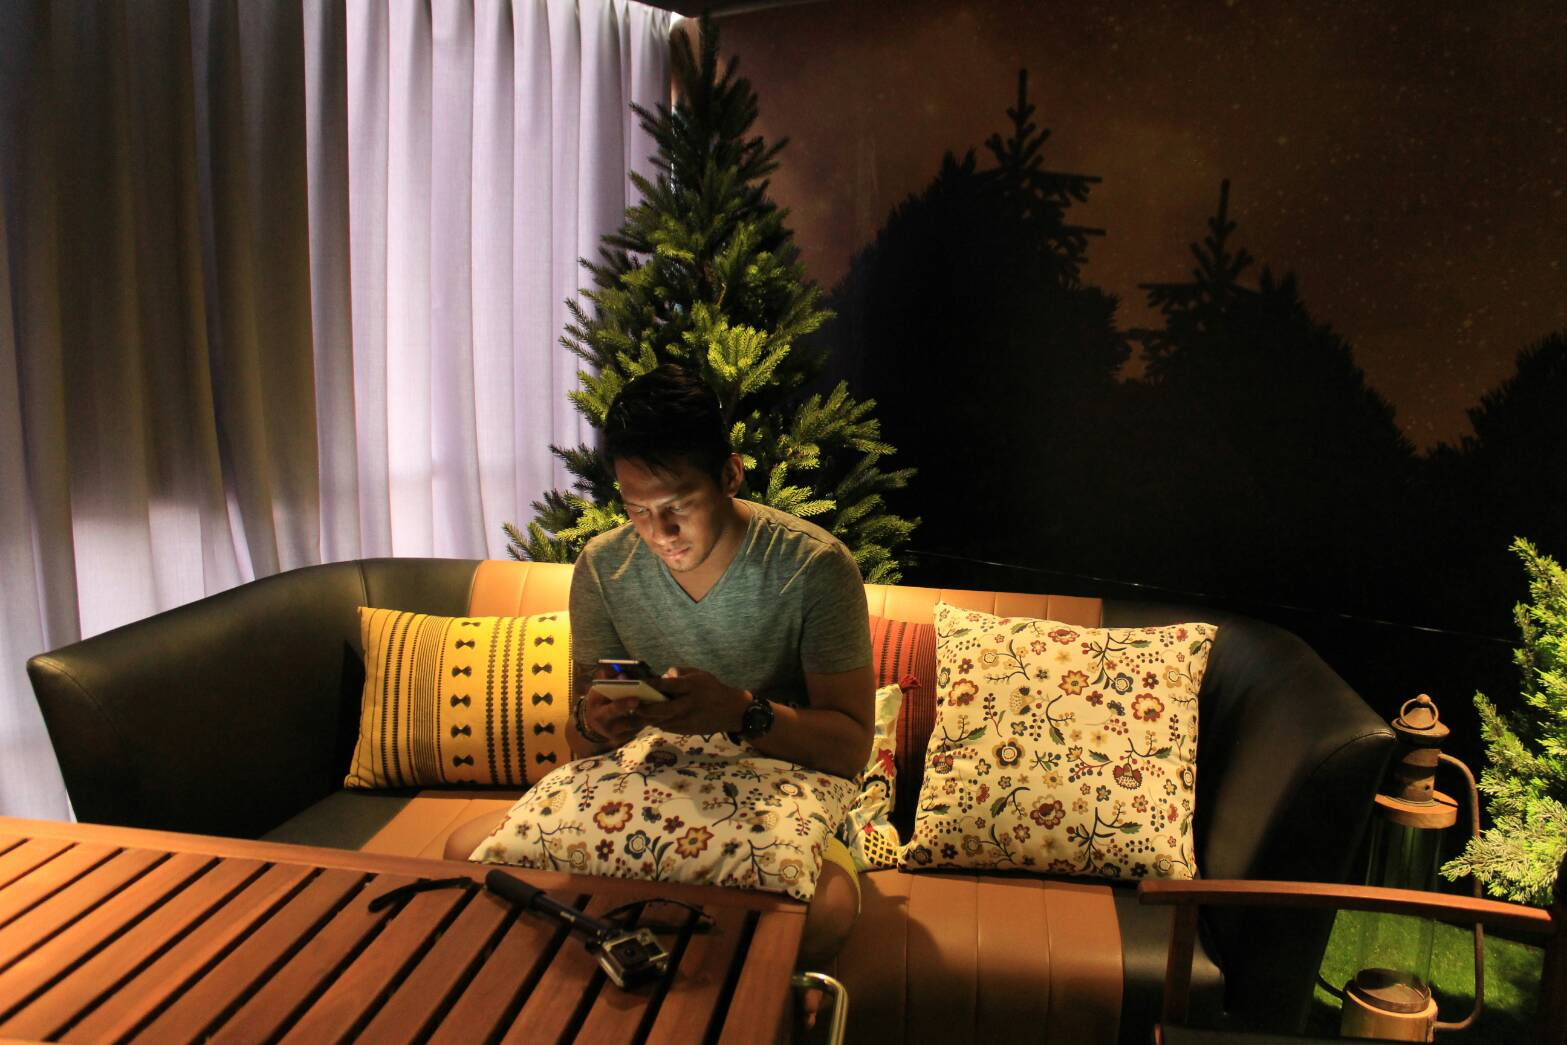 Cowok Manis Lagi Piknik  Nights At A Fun Artsy Hotel